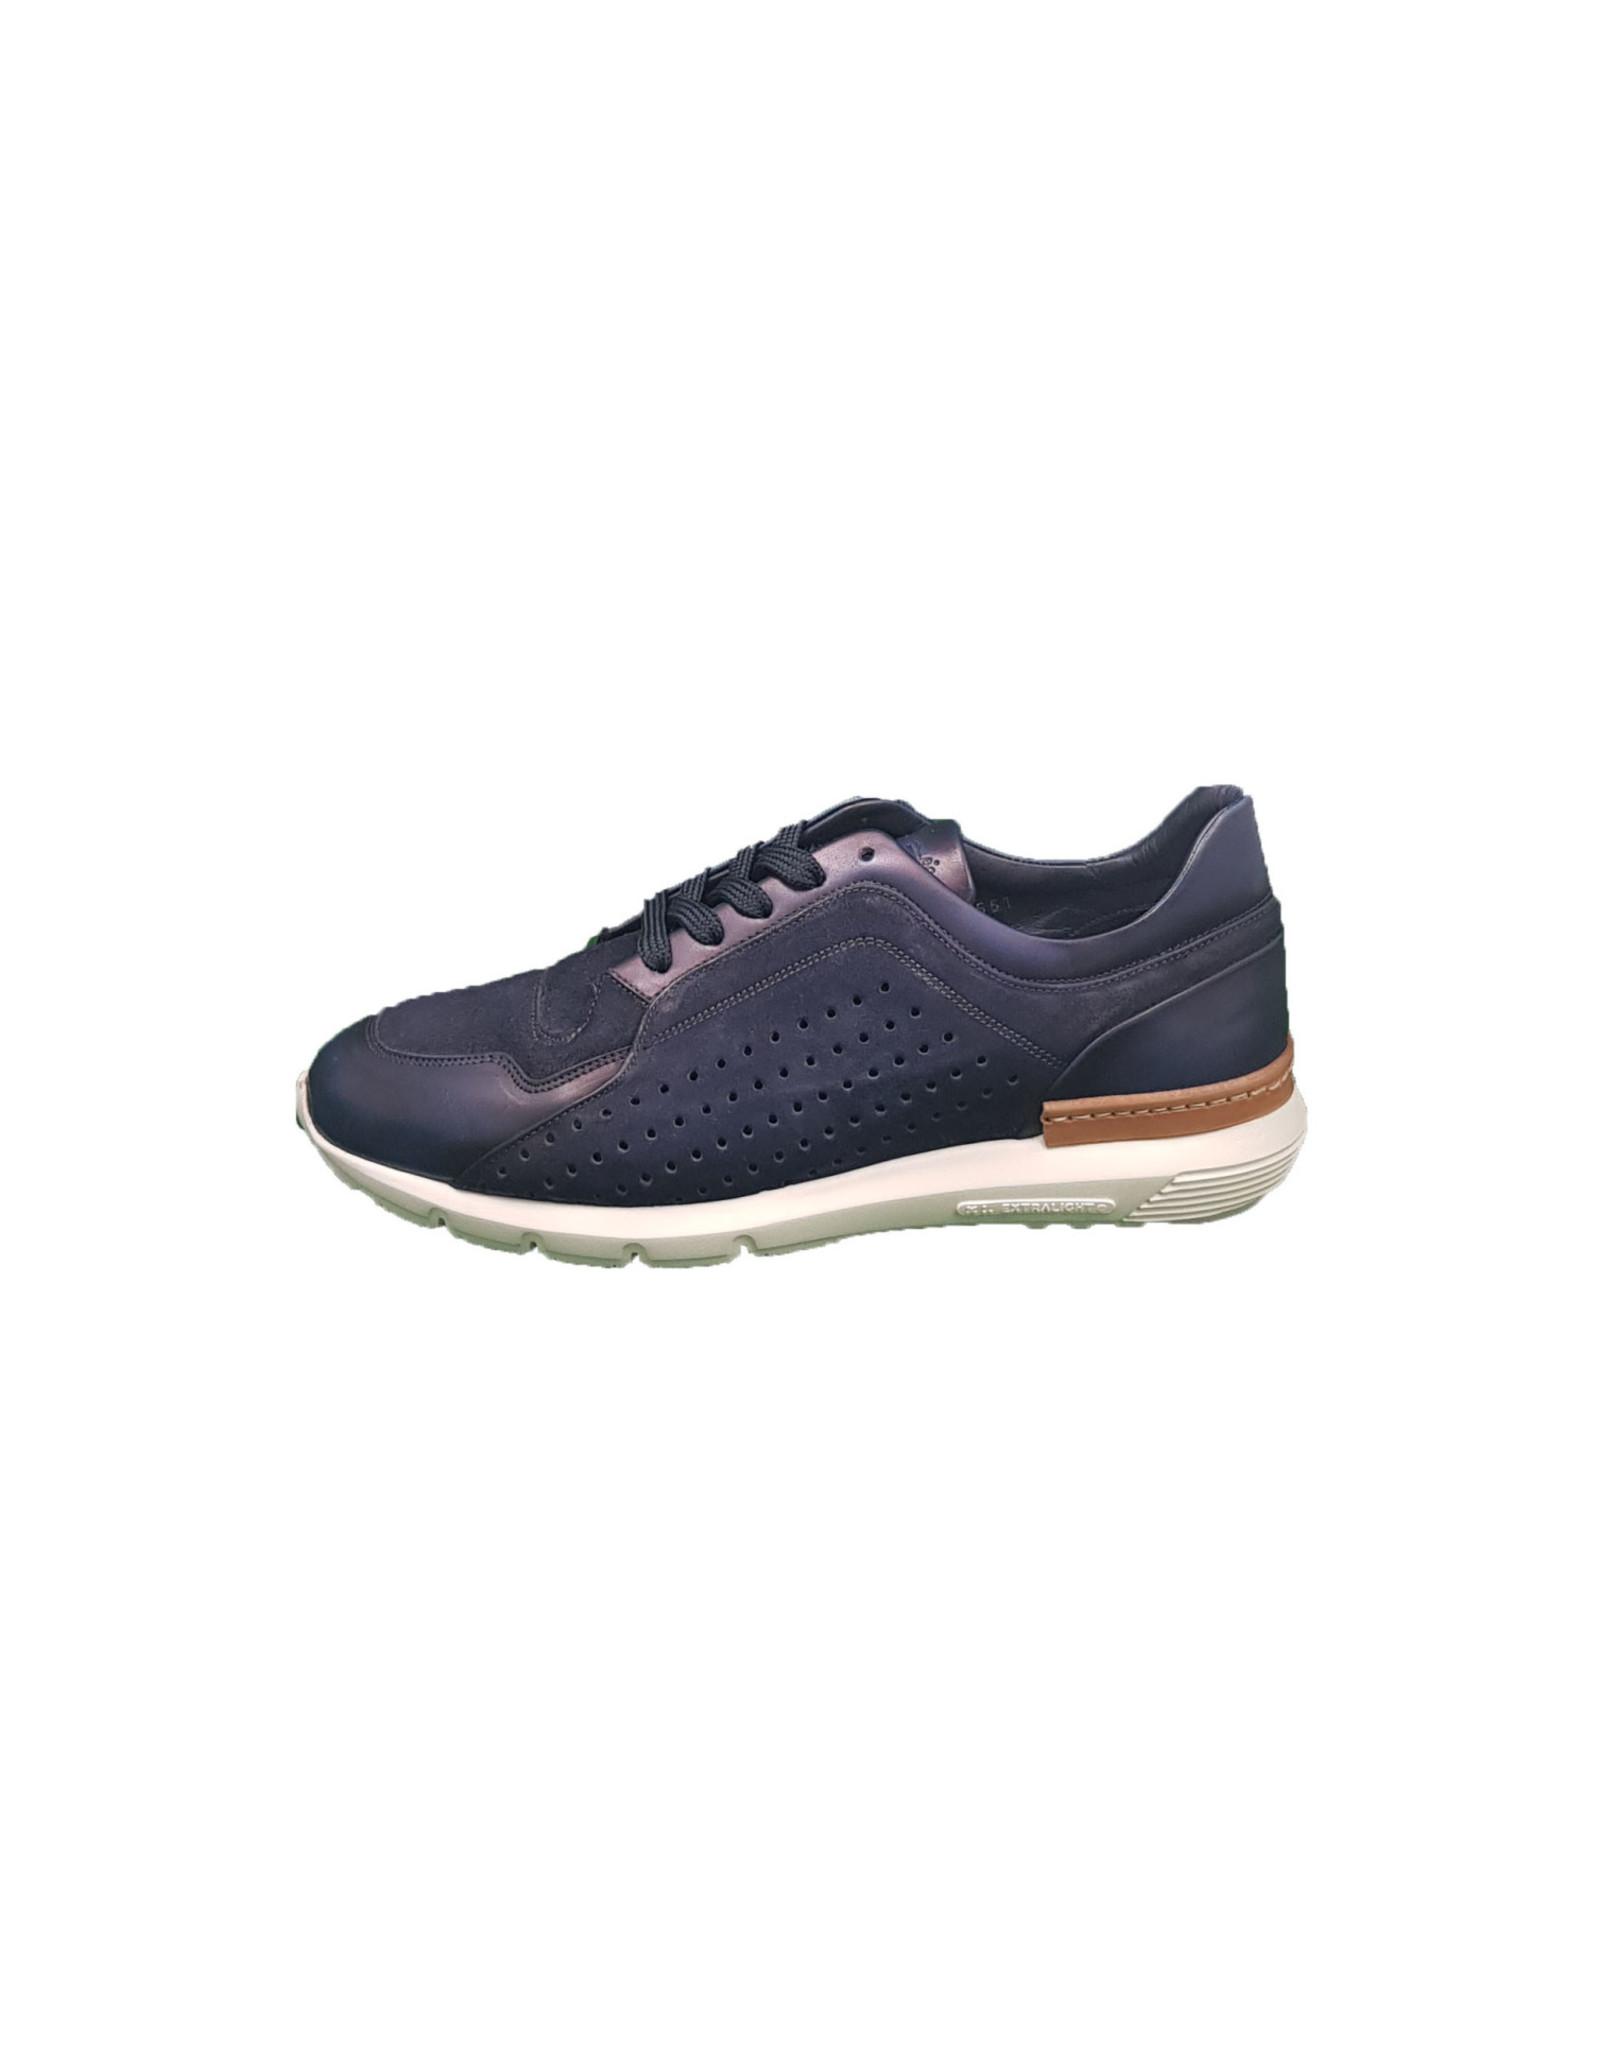 Zampiere Zampiere schoenen blauw Delave Capri M:5399